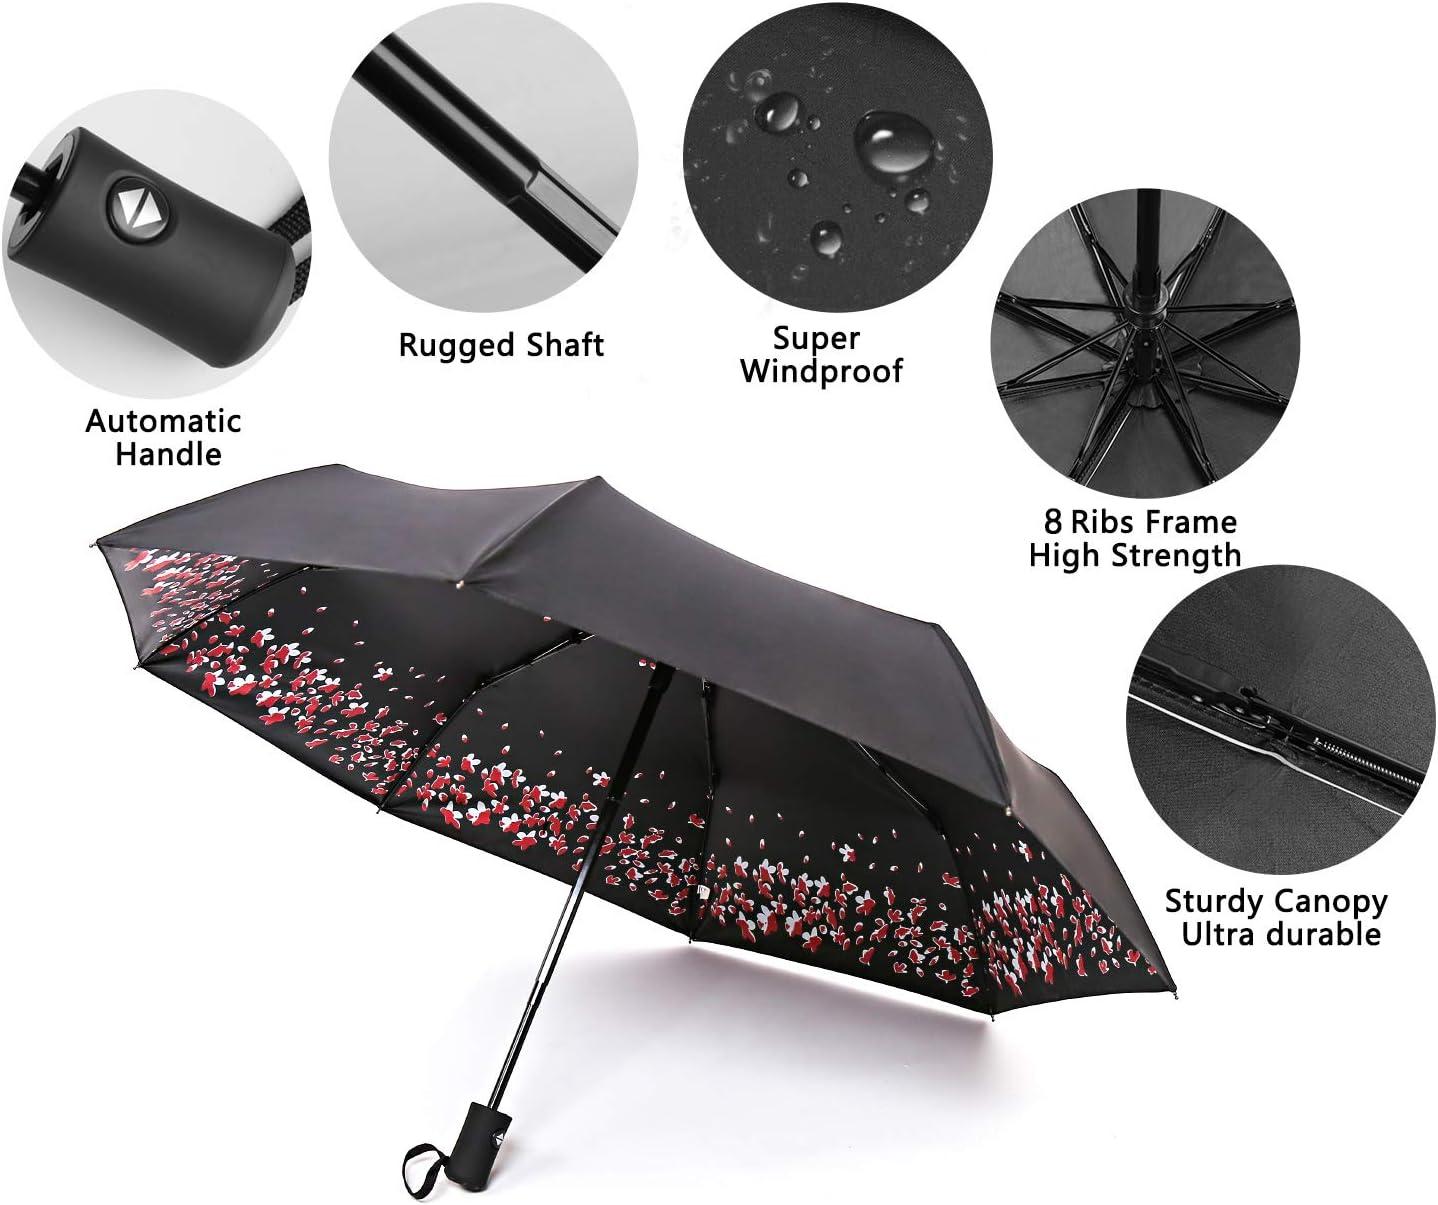 ANINILY Cute Dog 3 Folds Auto Open Close Umbrella Black Glue Anti UV Coating Compact Folding Umbrellas for Women Men